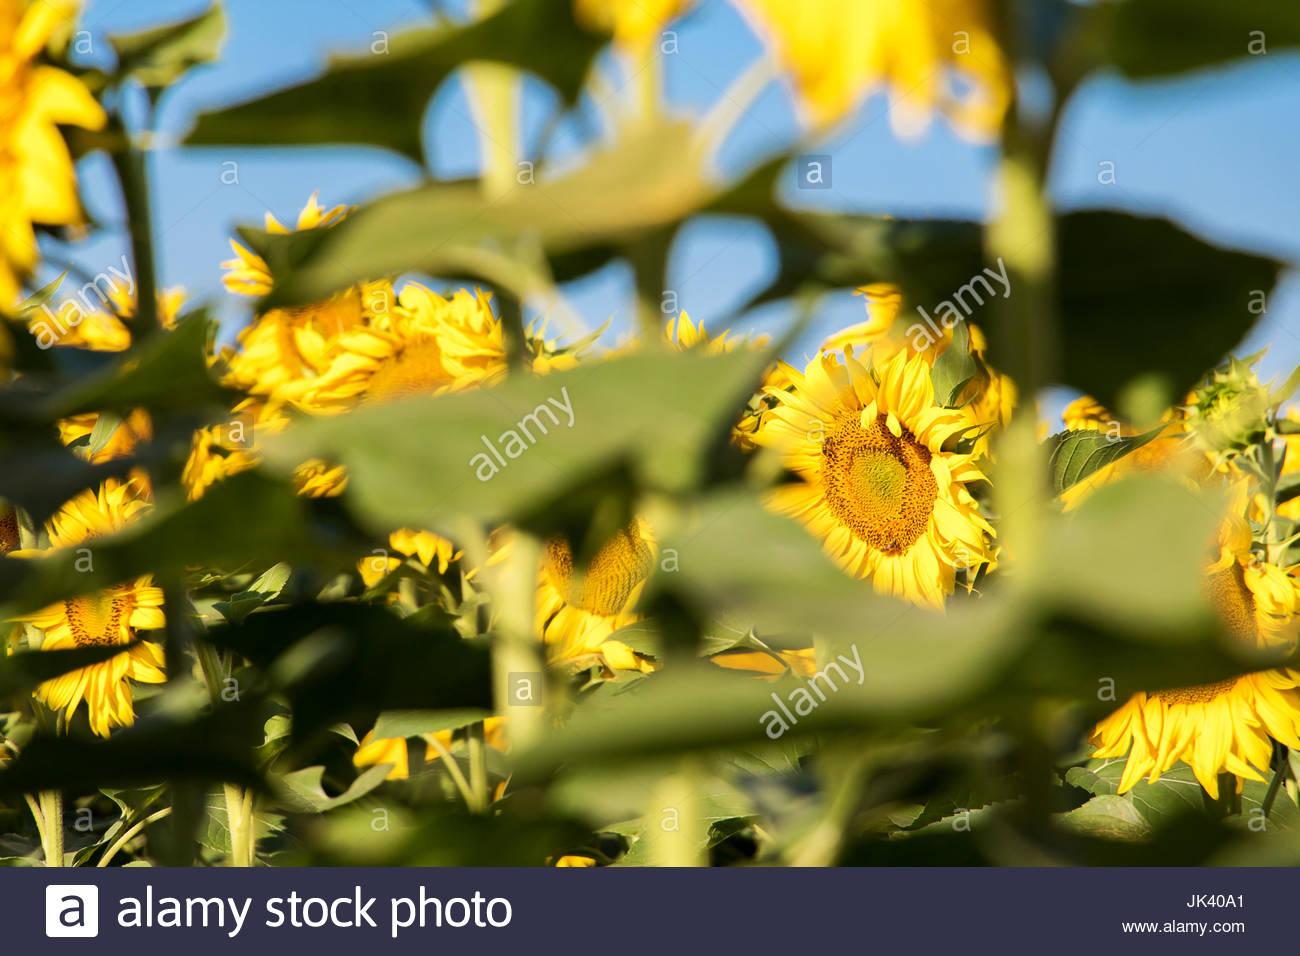 Sonnenblume Bilder Sonnenblumen wachsen Farbe Blumen Frankreich Sonnenblumen Provence Sonnenblumen hoch modernen Stockbild